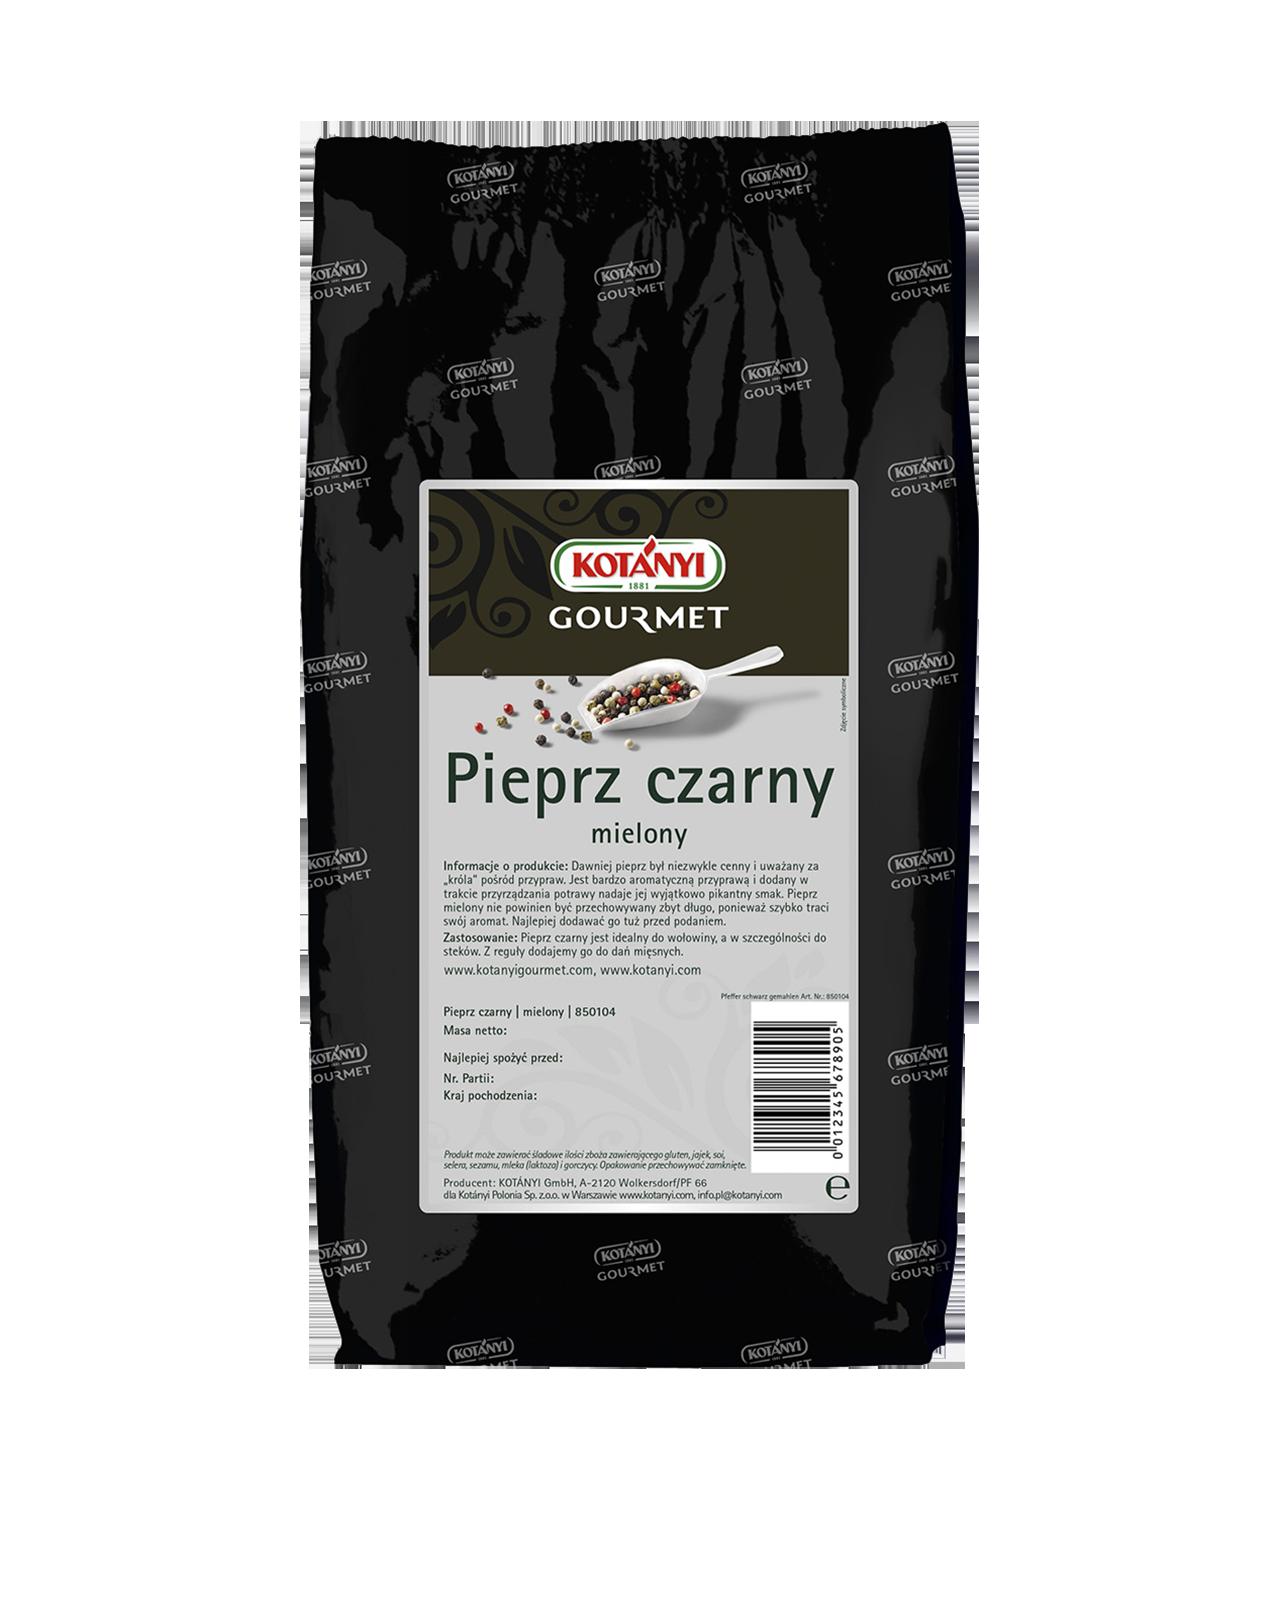 850104 Kotanyi Pieprz Czarny Mielony B2b Bag 1000g